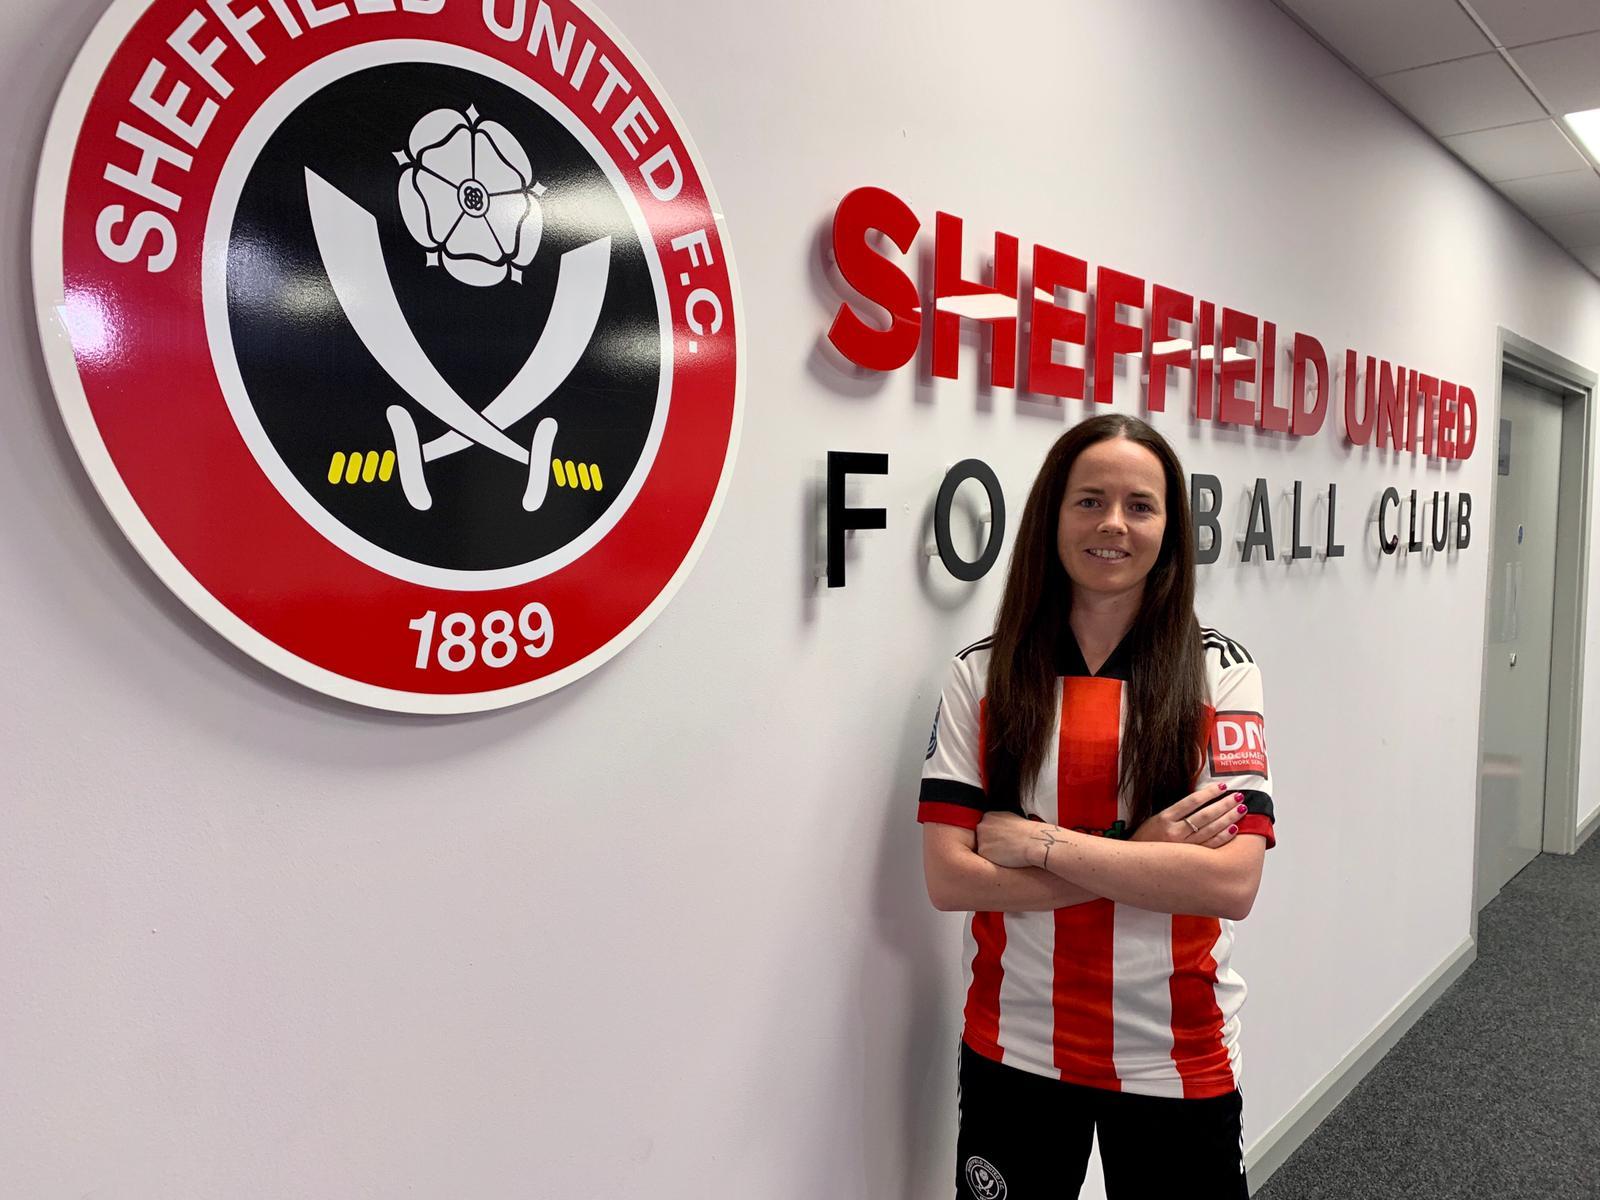 Sheffield United's new signing, Olivia Chance